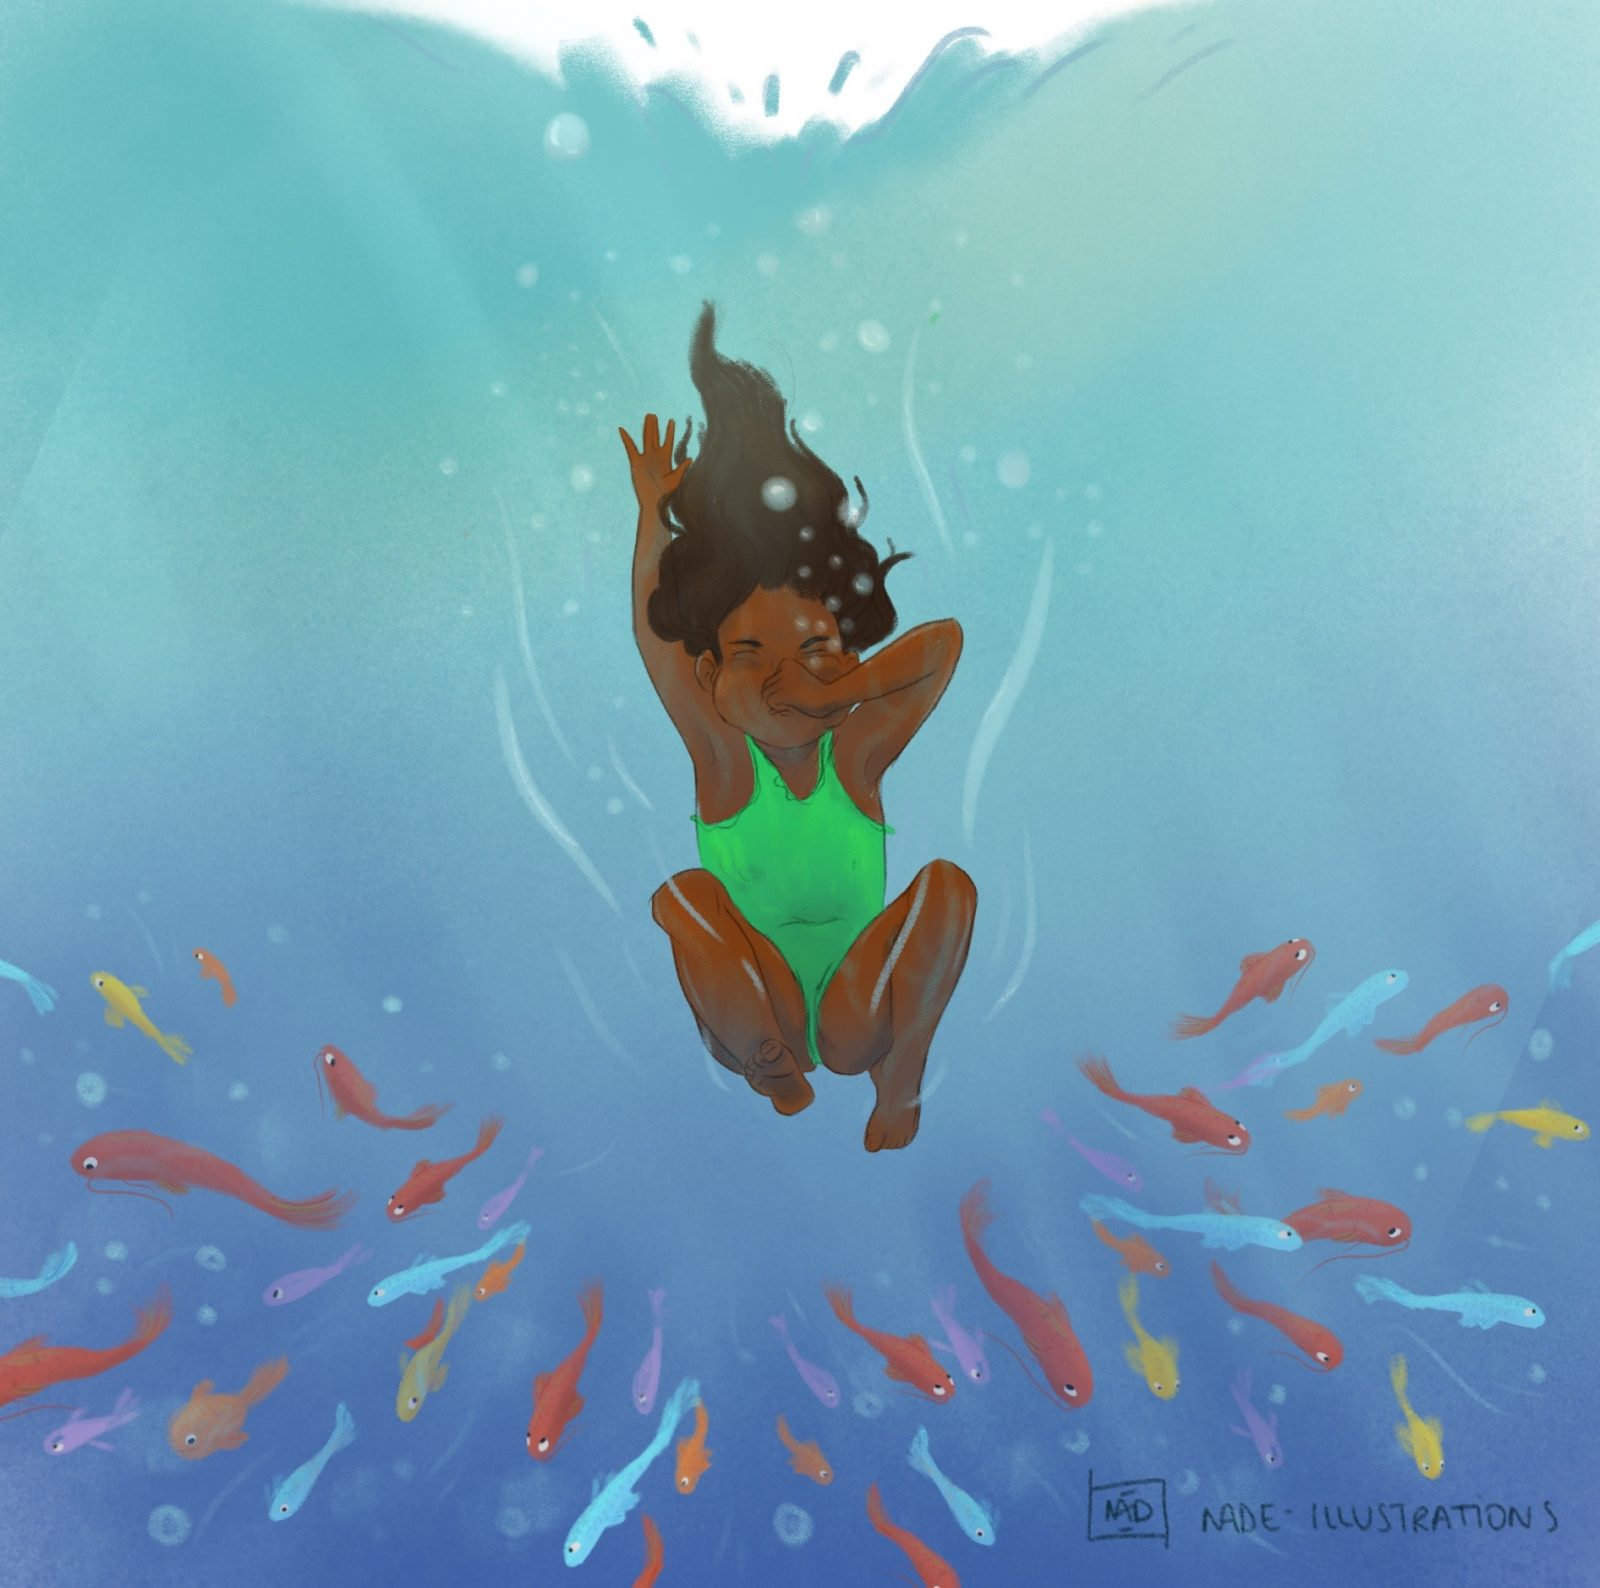 illustration-jeunesse-6-nade